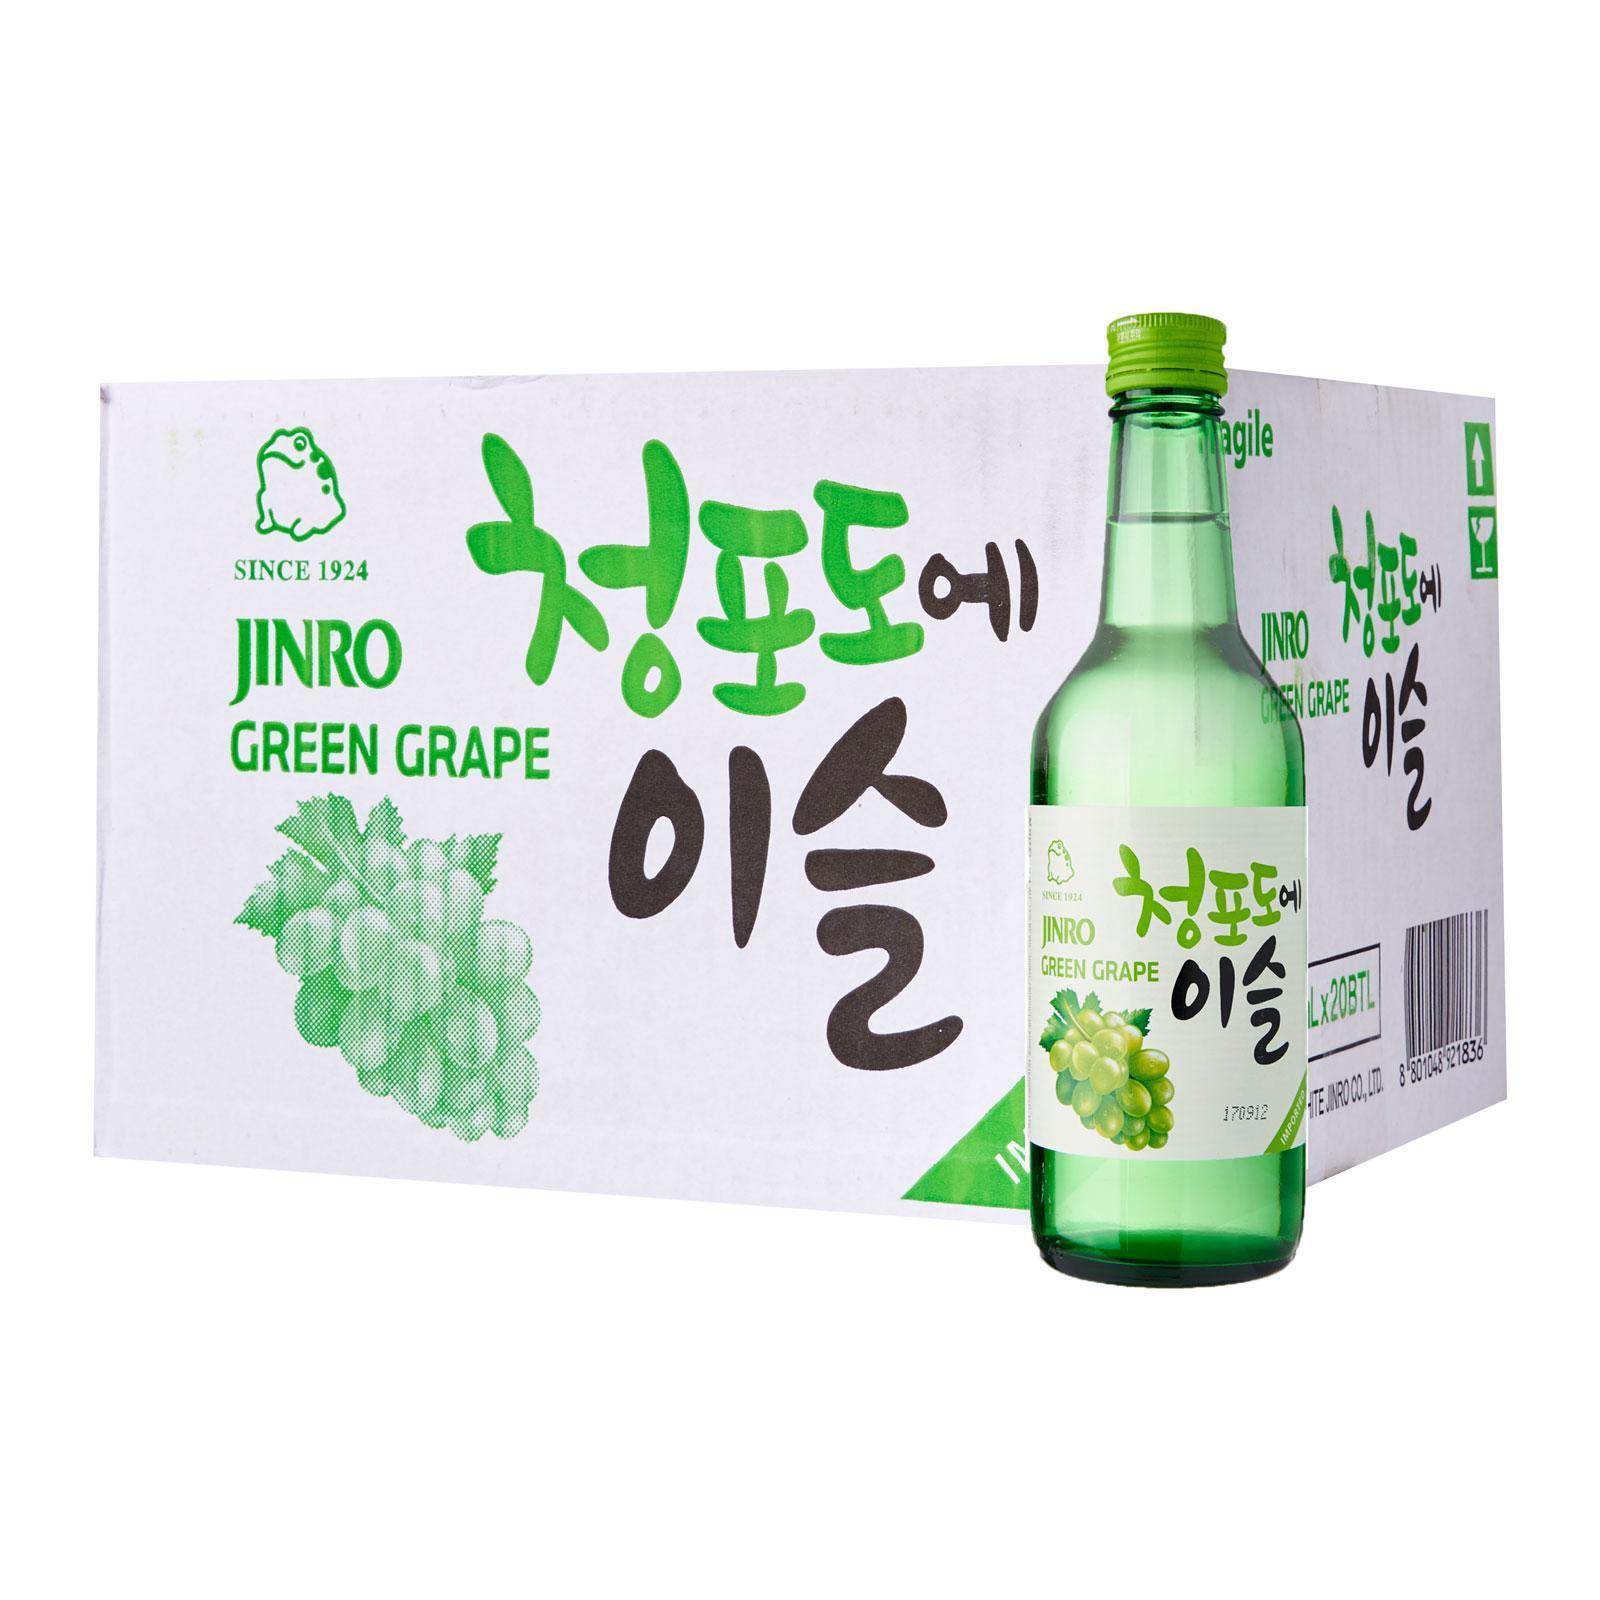 Jinro Green Grape Soju Carton (20 Bottles) By Geonbae